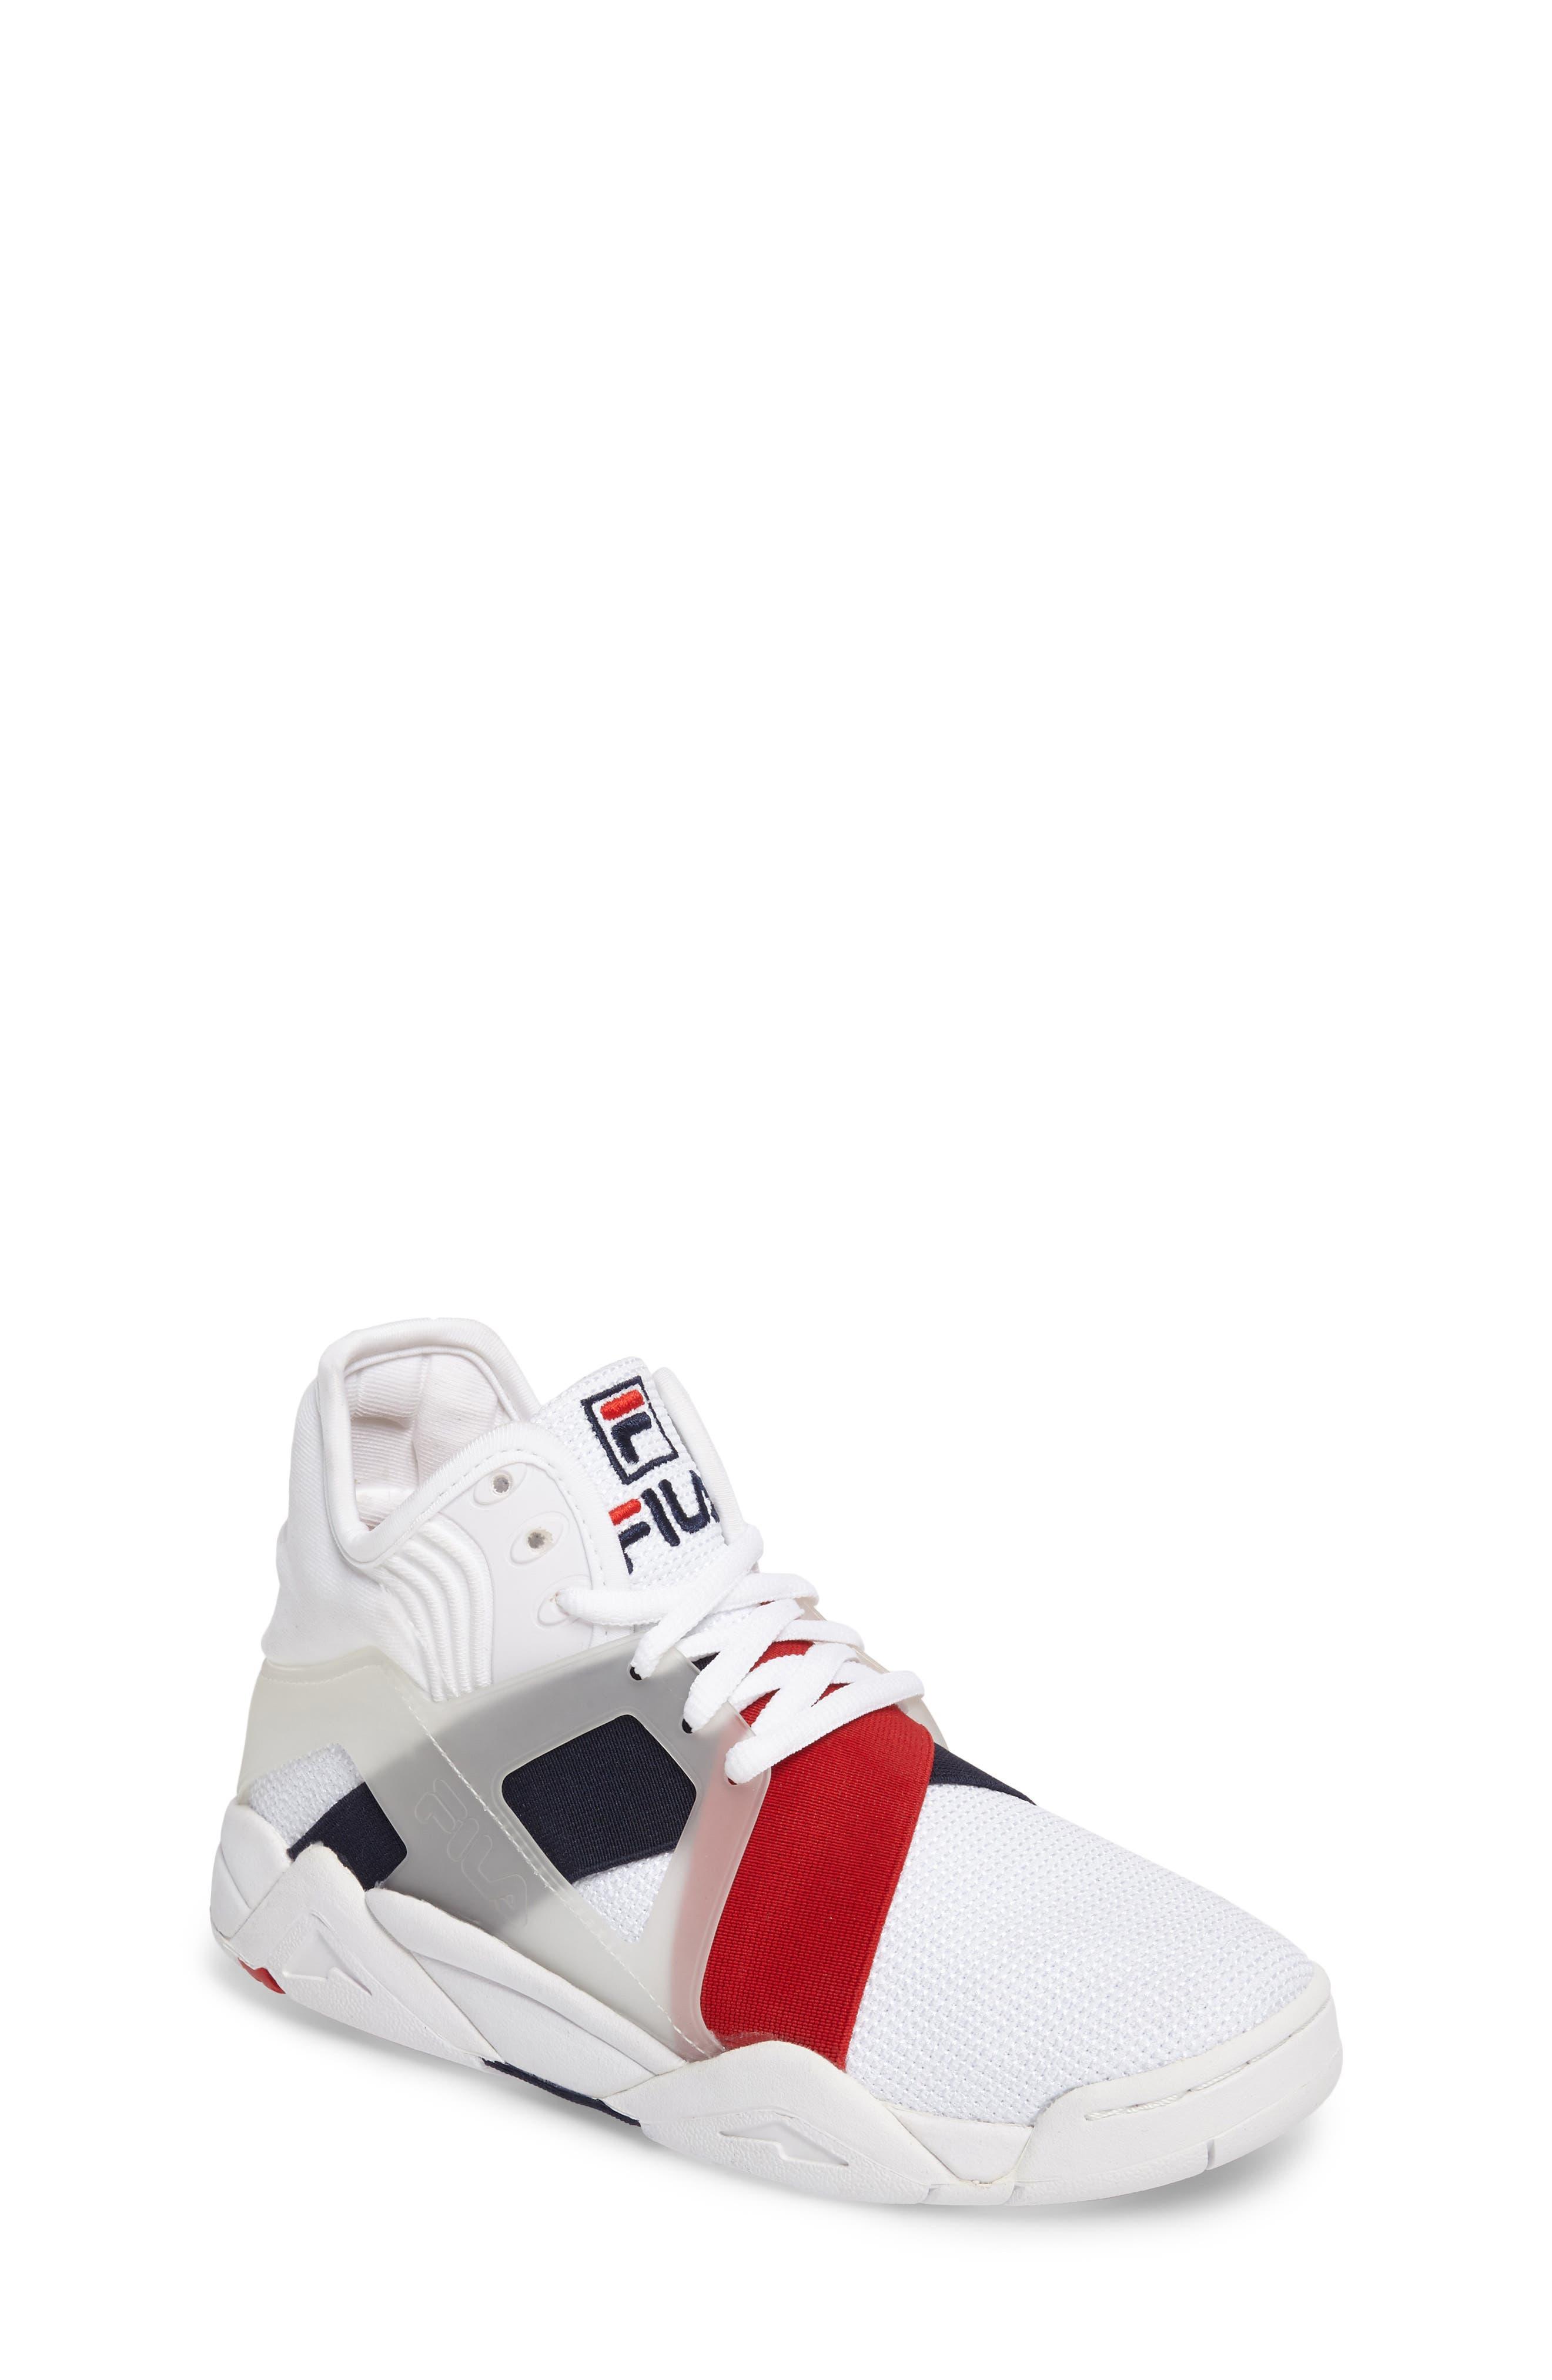 FILA Cage 17 Logo High Top Sneaker (Big Kid)